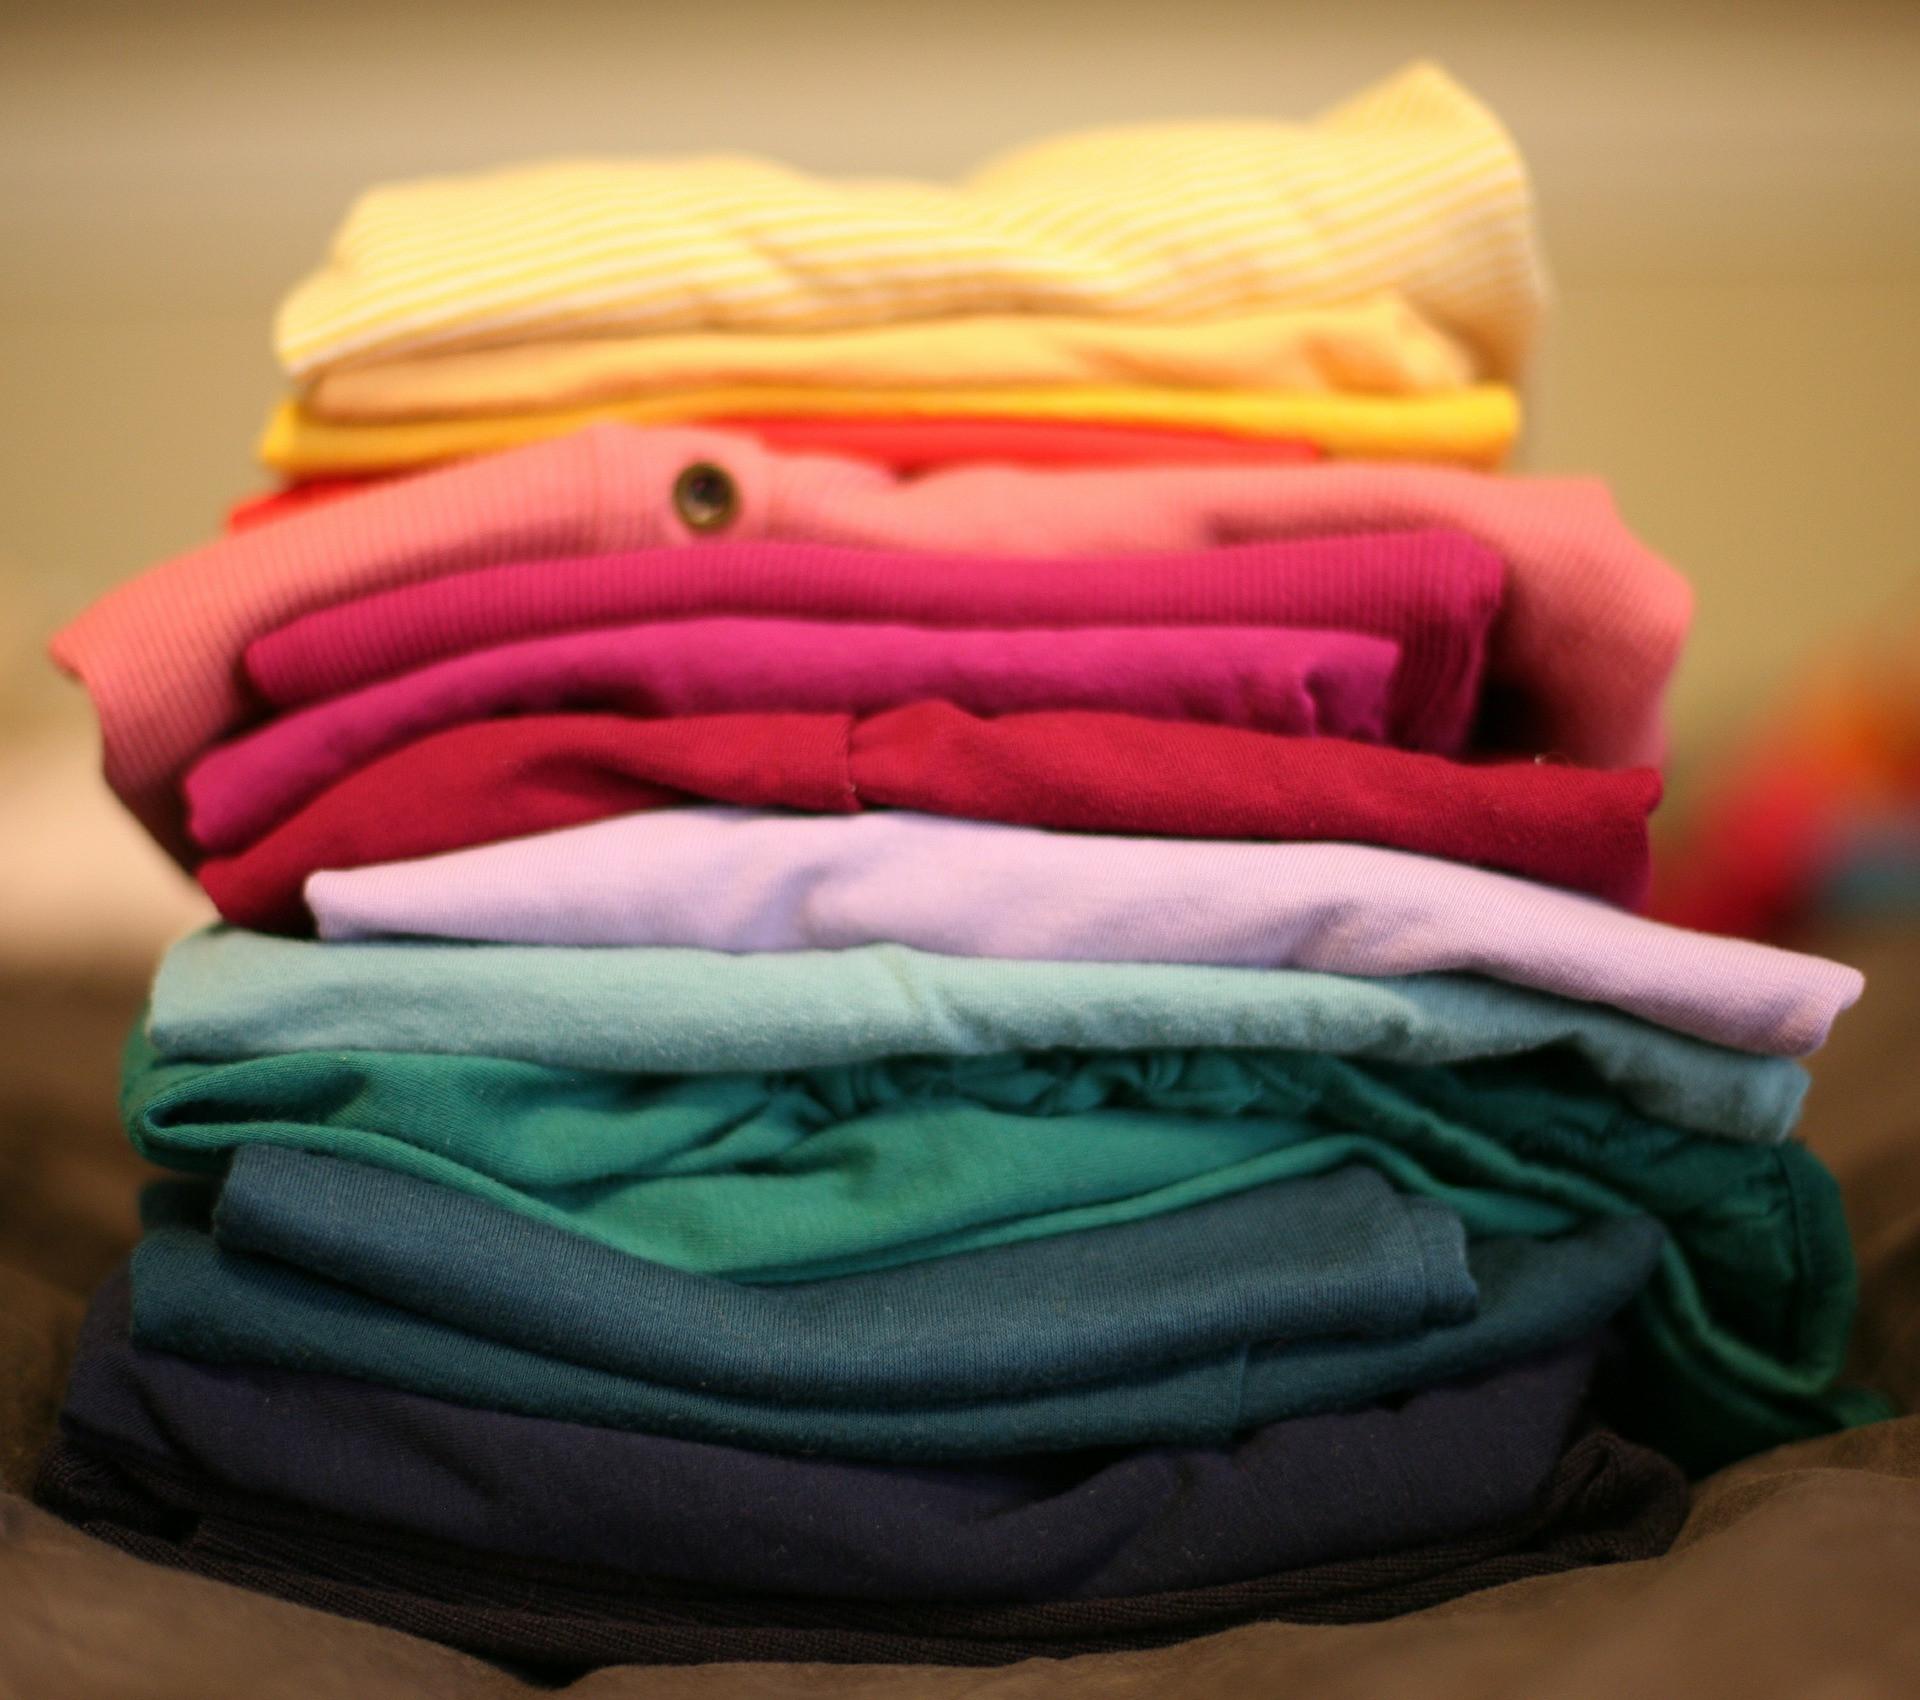 Fluff & Fold (Clean Laundry)